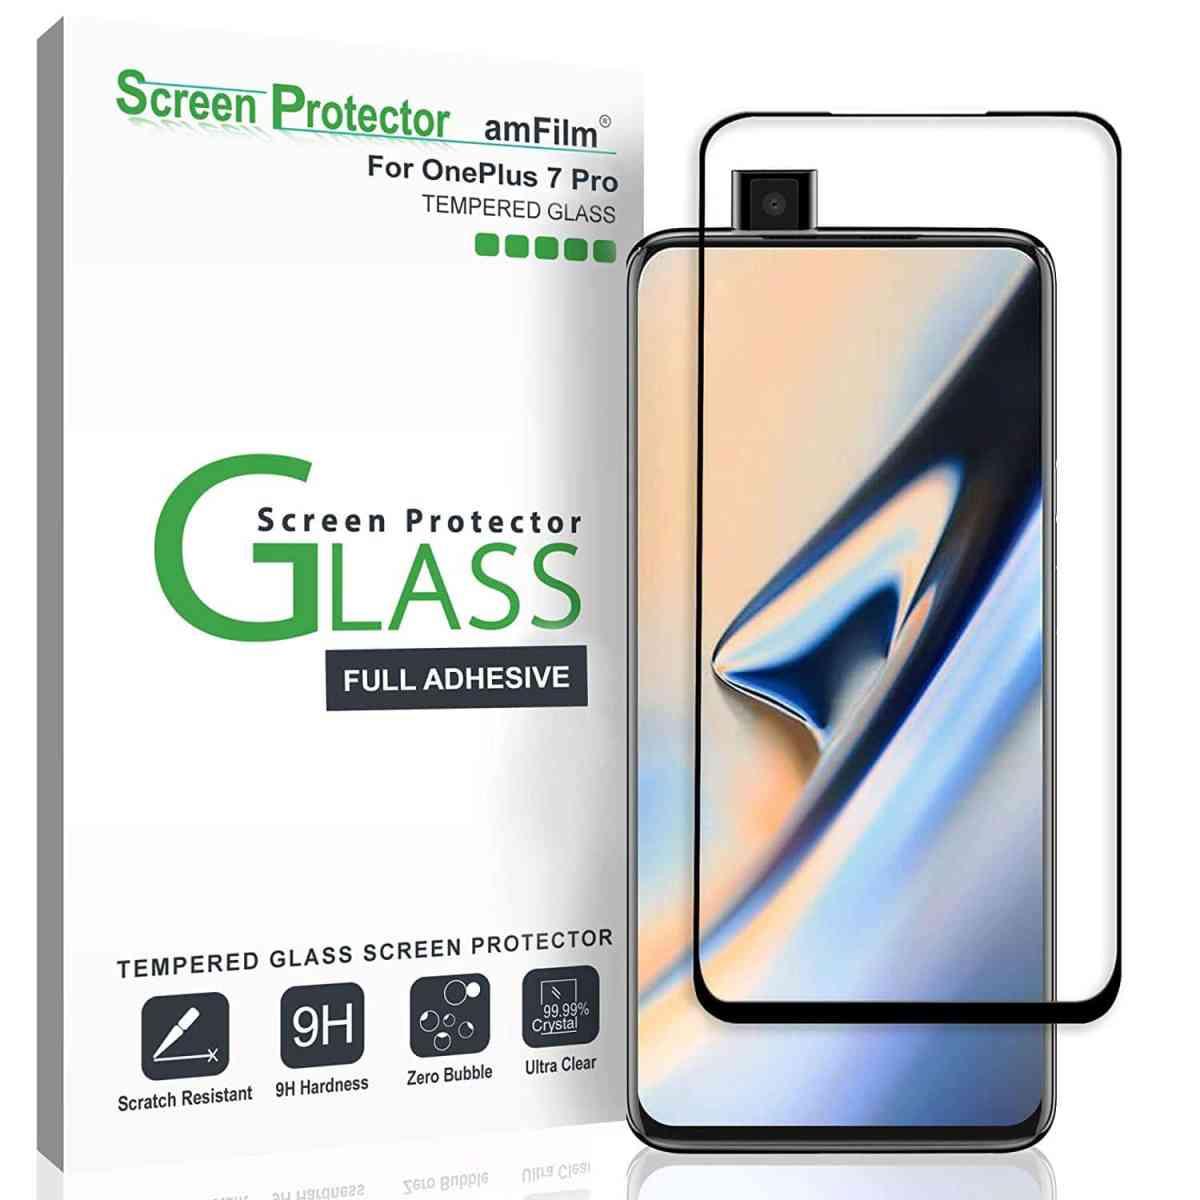 amFilm Best OnePlus 7 Pro Screen Protectors